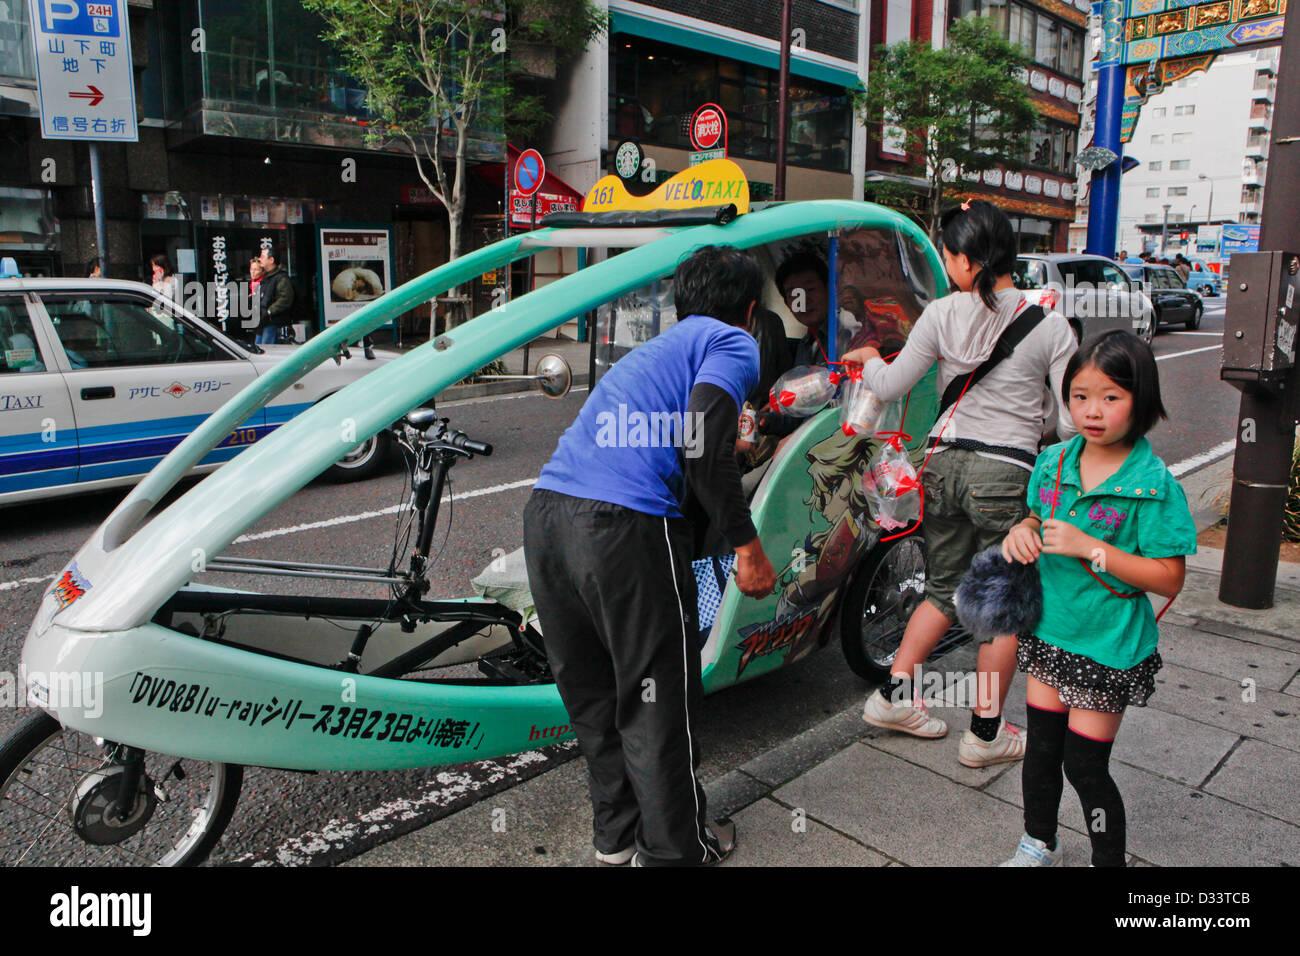 Taxi, Yokohama, Japan - Stock Image